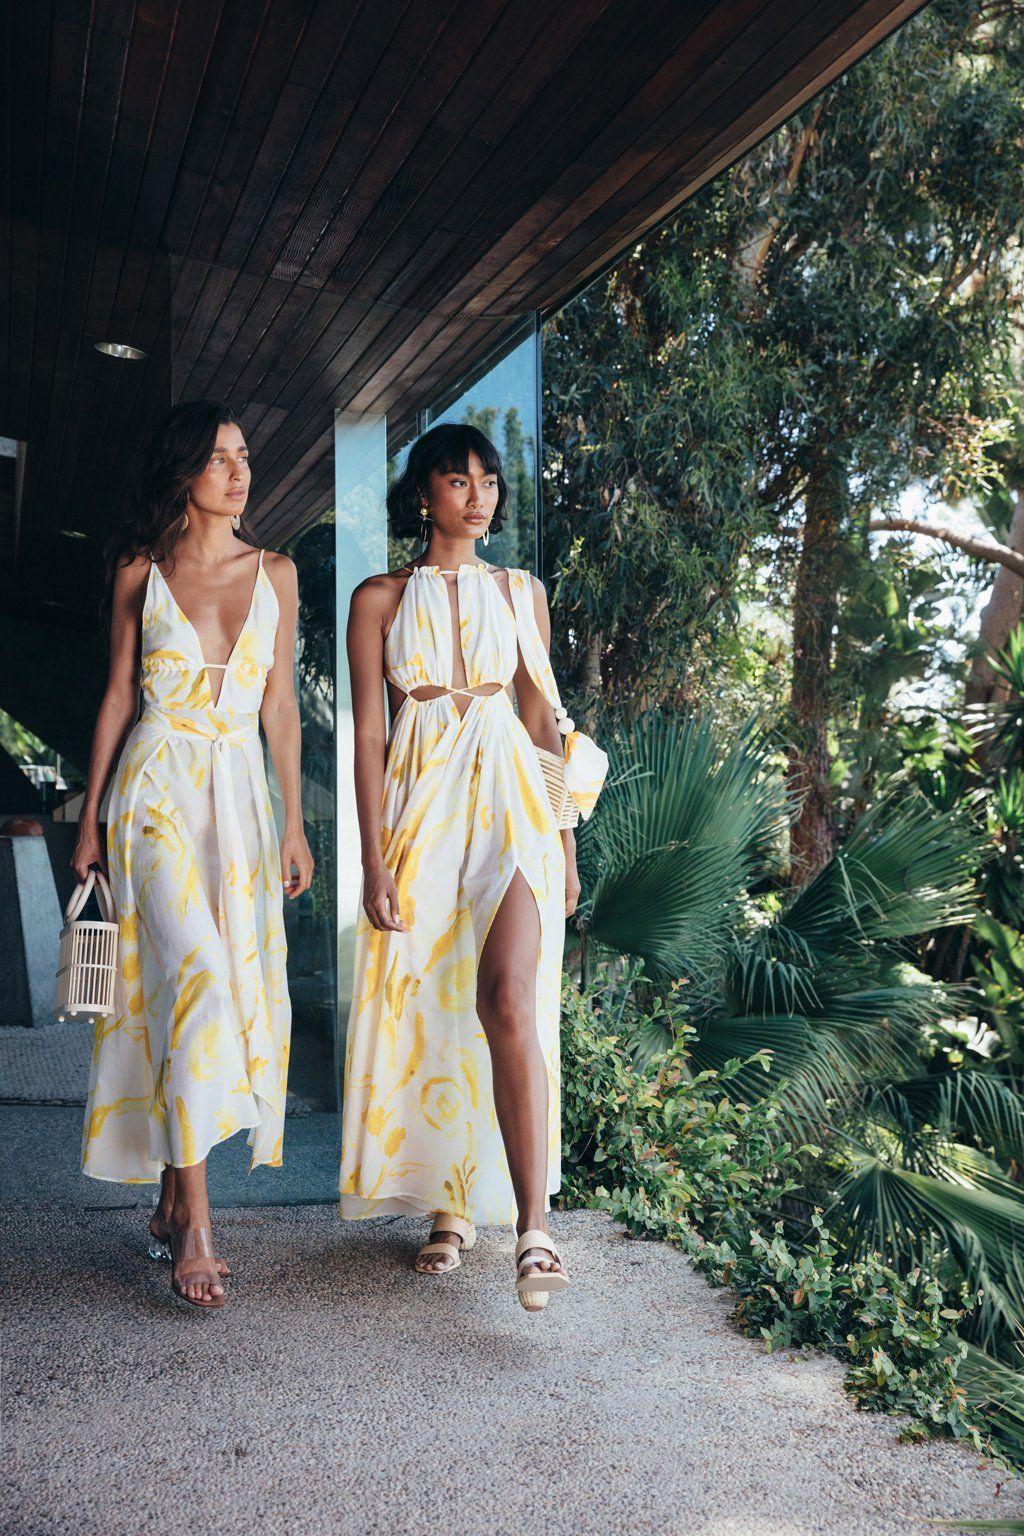 Tropical Summer Dresses Beachwear Fashion Fashion Summer Dresses [ 1536 x 1024 Pixel ]